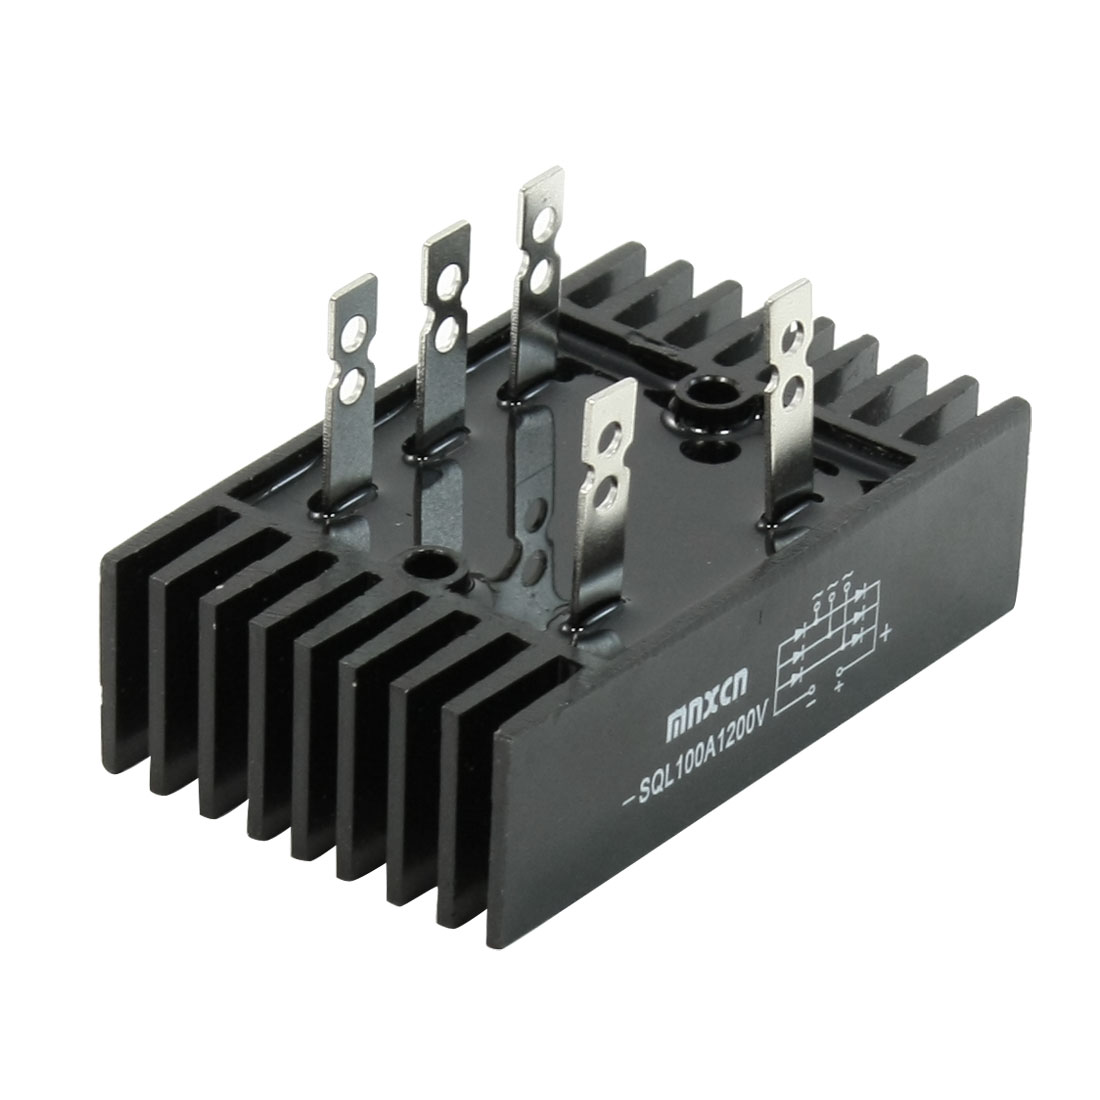 -SQL Heatsink Shape Bridge Rectifier 3 Phase Diode 100A 1200V